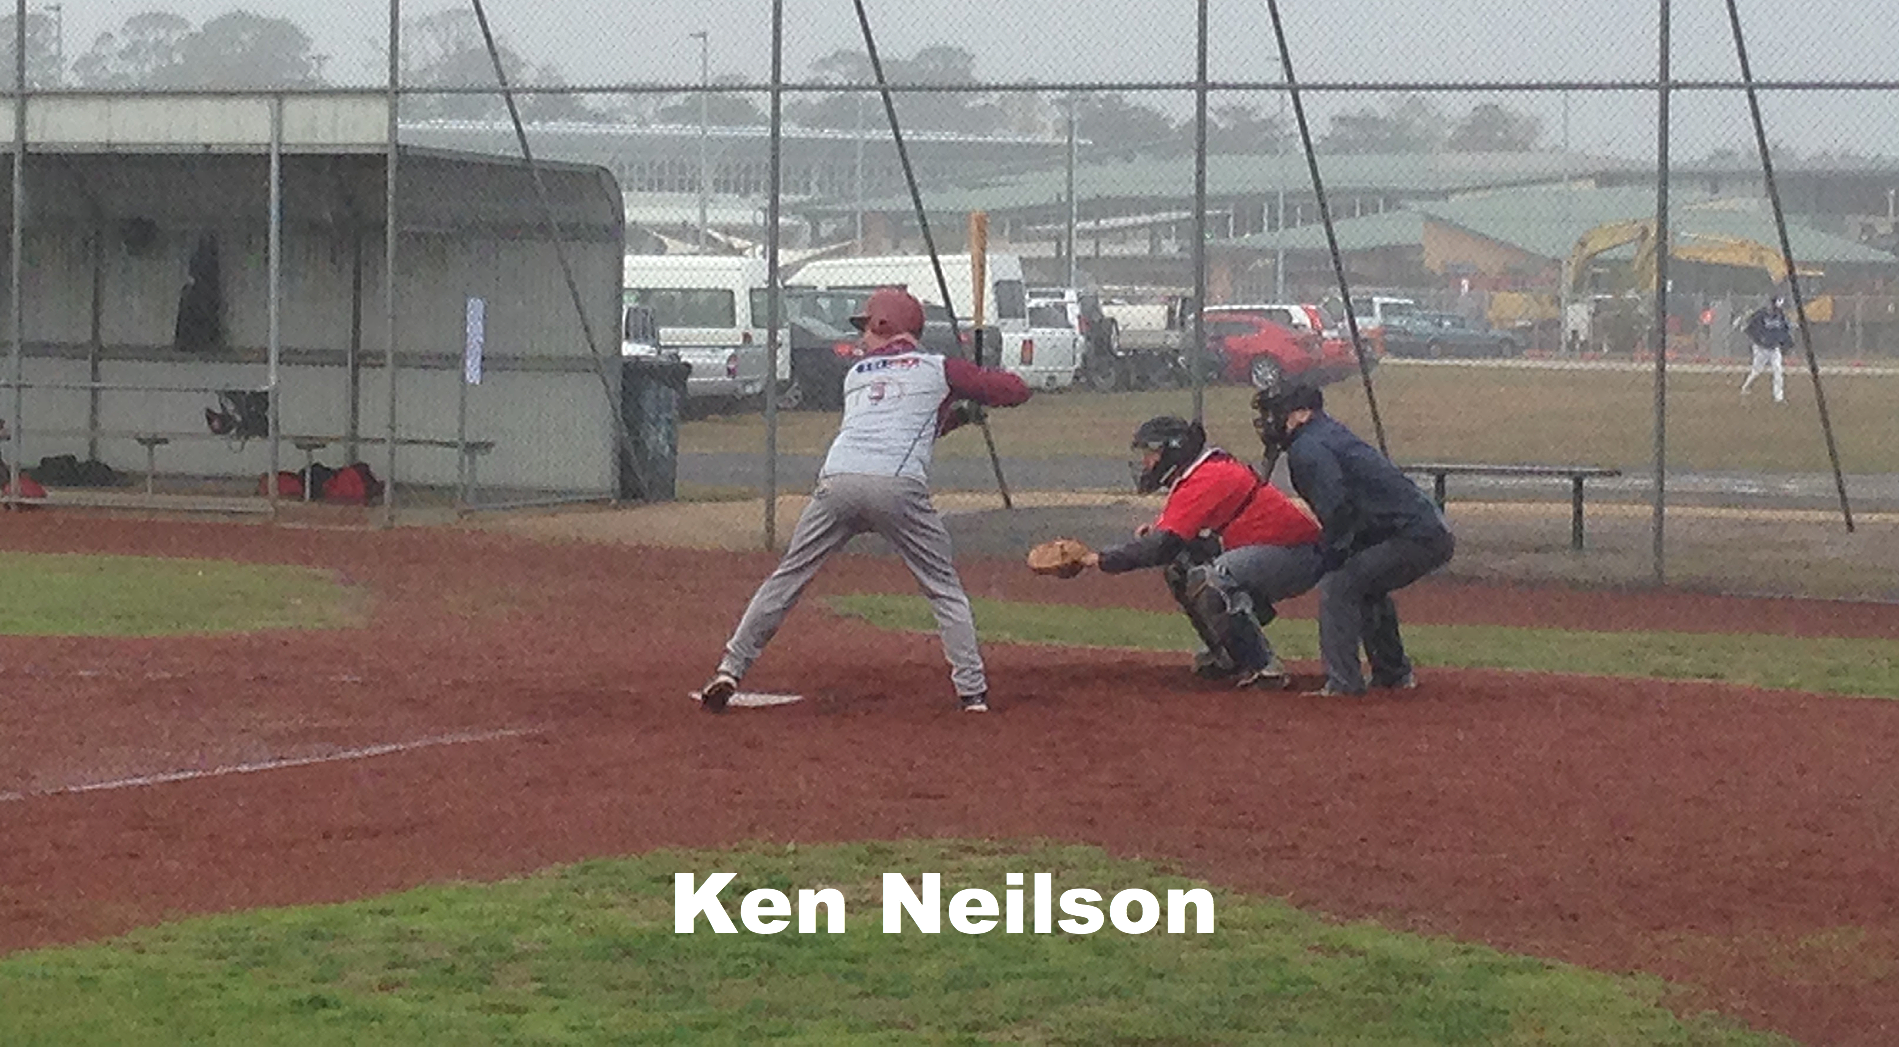 Ken at bat